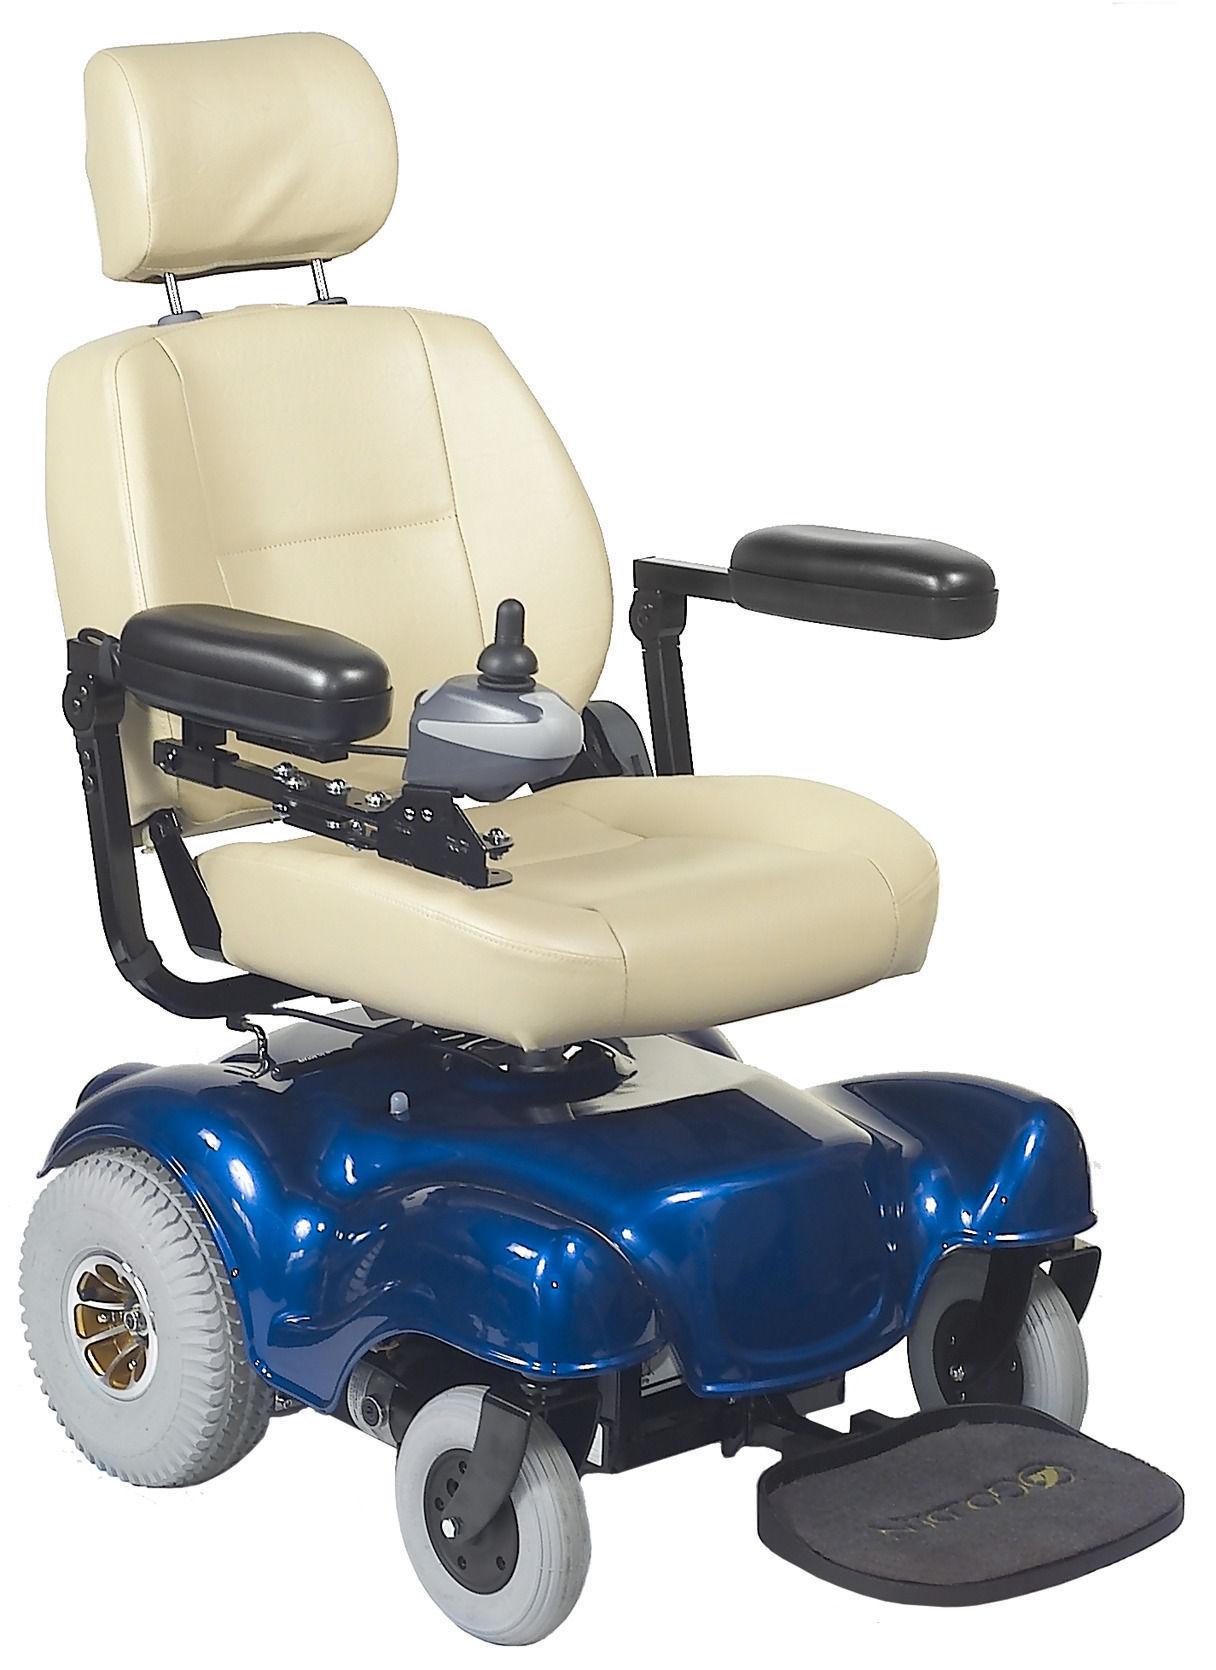 Servo Motor for Handicapped chair wheel free 3D model STL